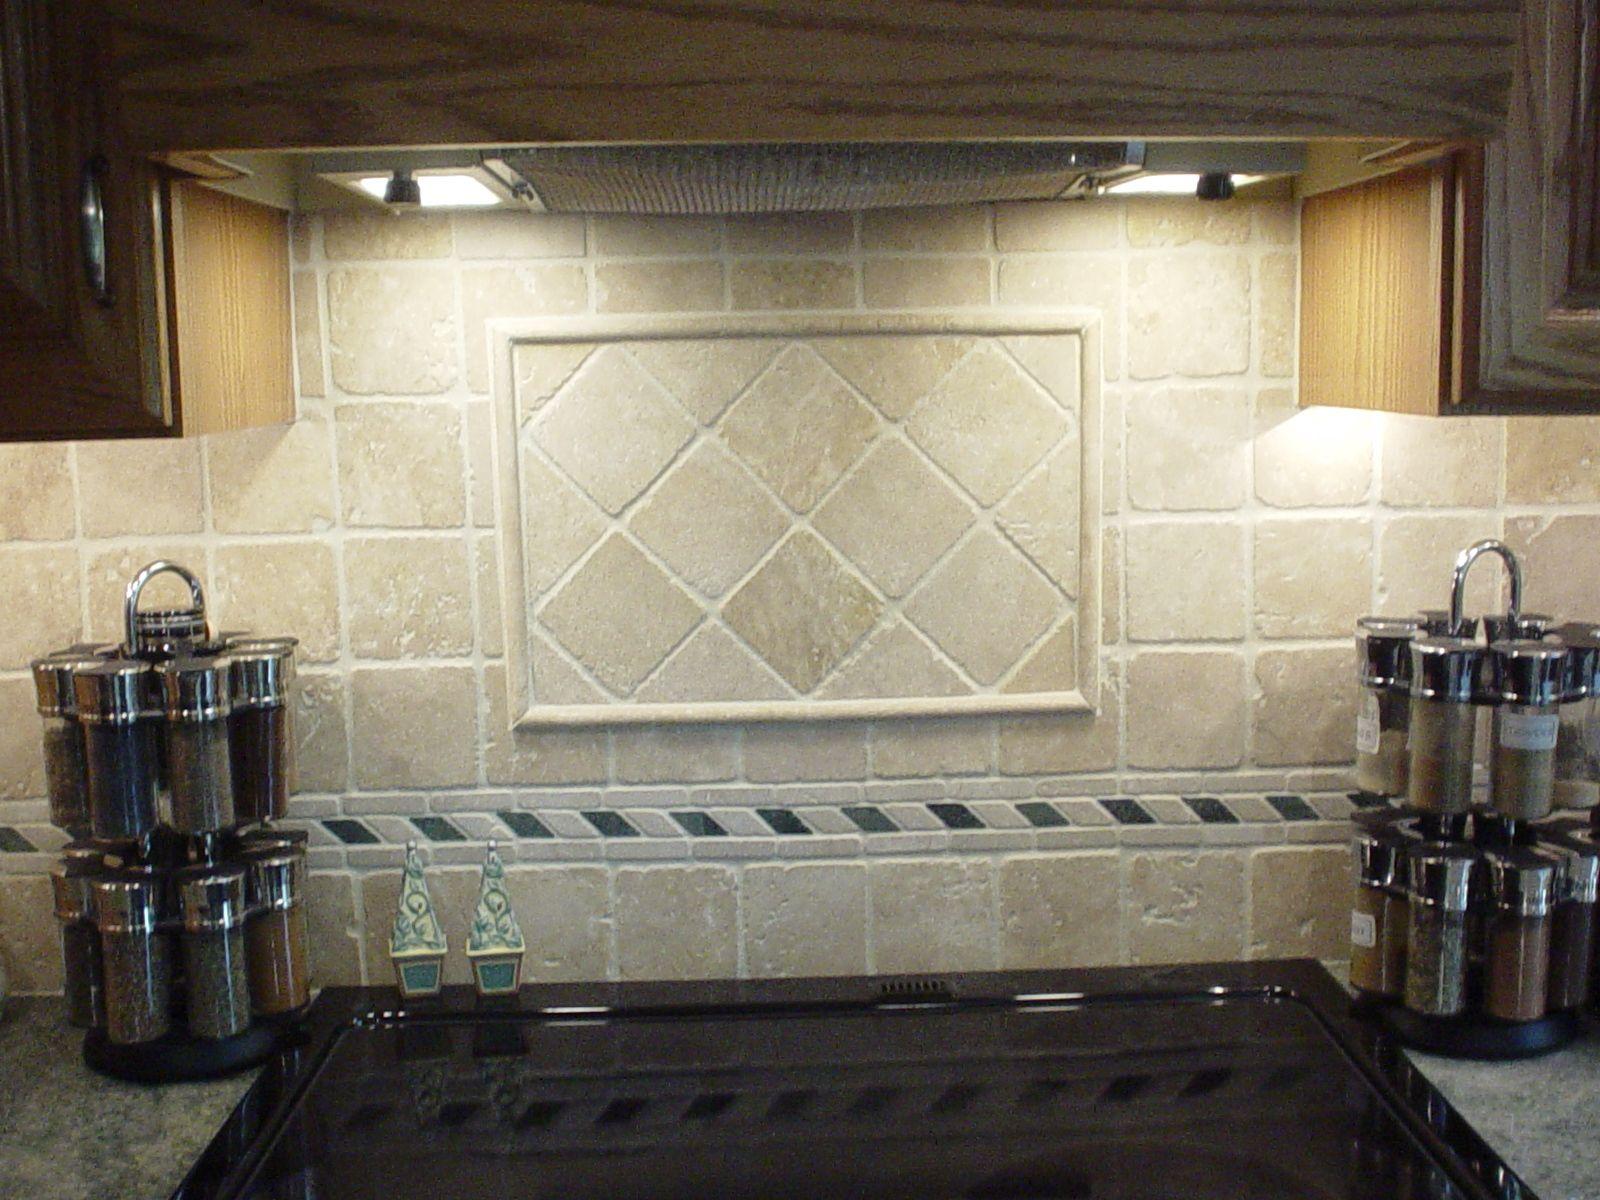 Marble Tile Kitchen Backsplash Tumbled Backsplash Limestone Noce Travertine Kitchen And Bathroom